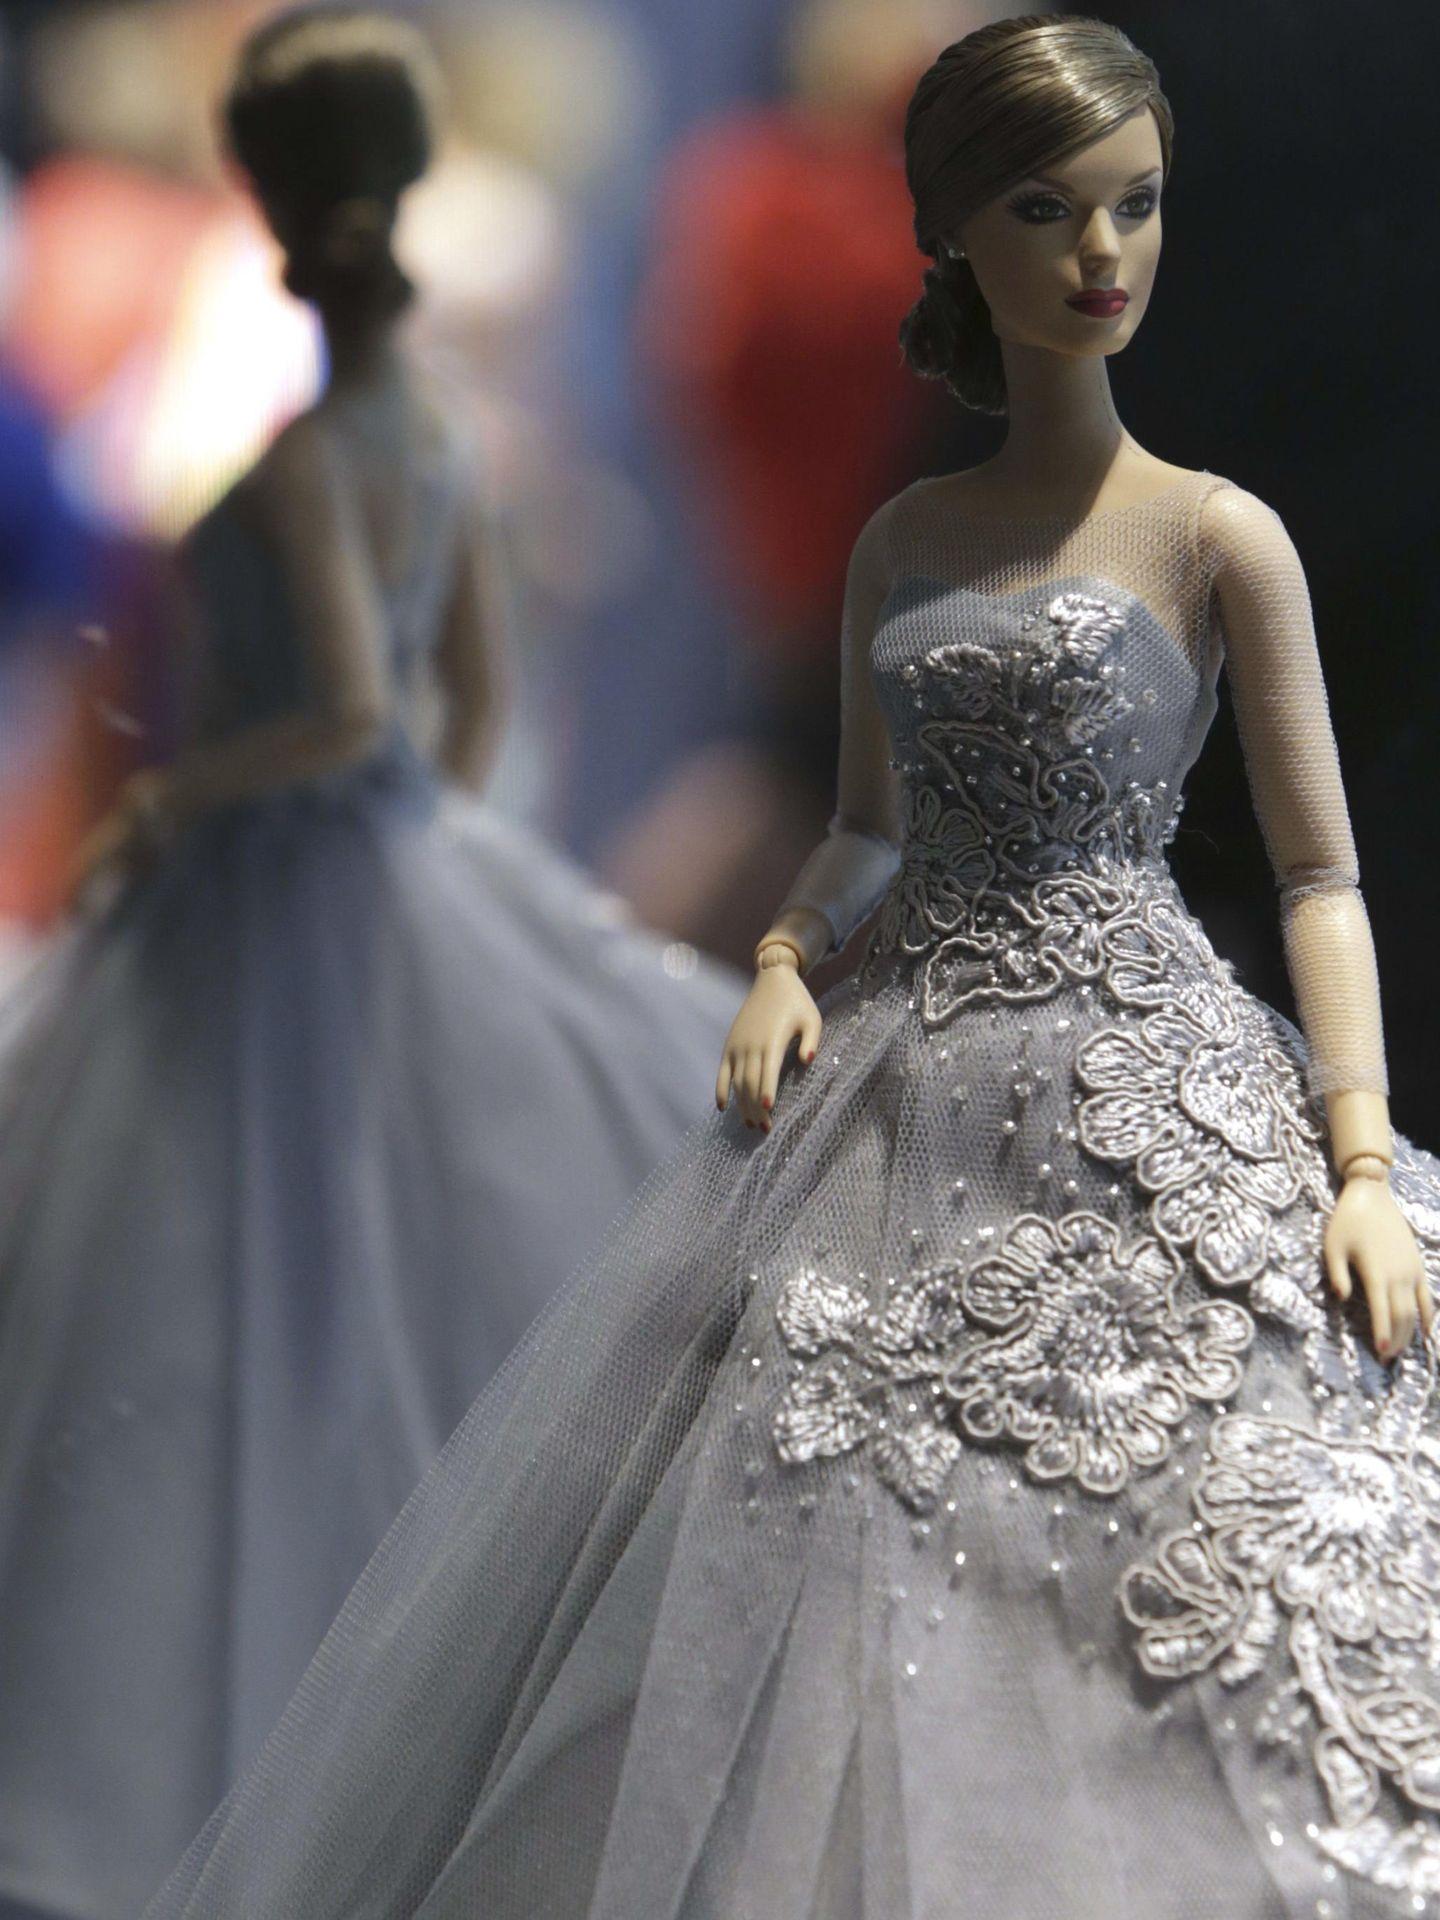 Muñeca Barbie, réplica de Letizia. (EFE)